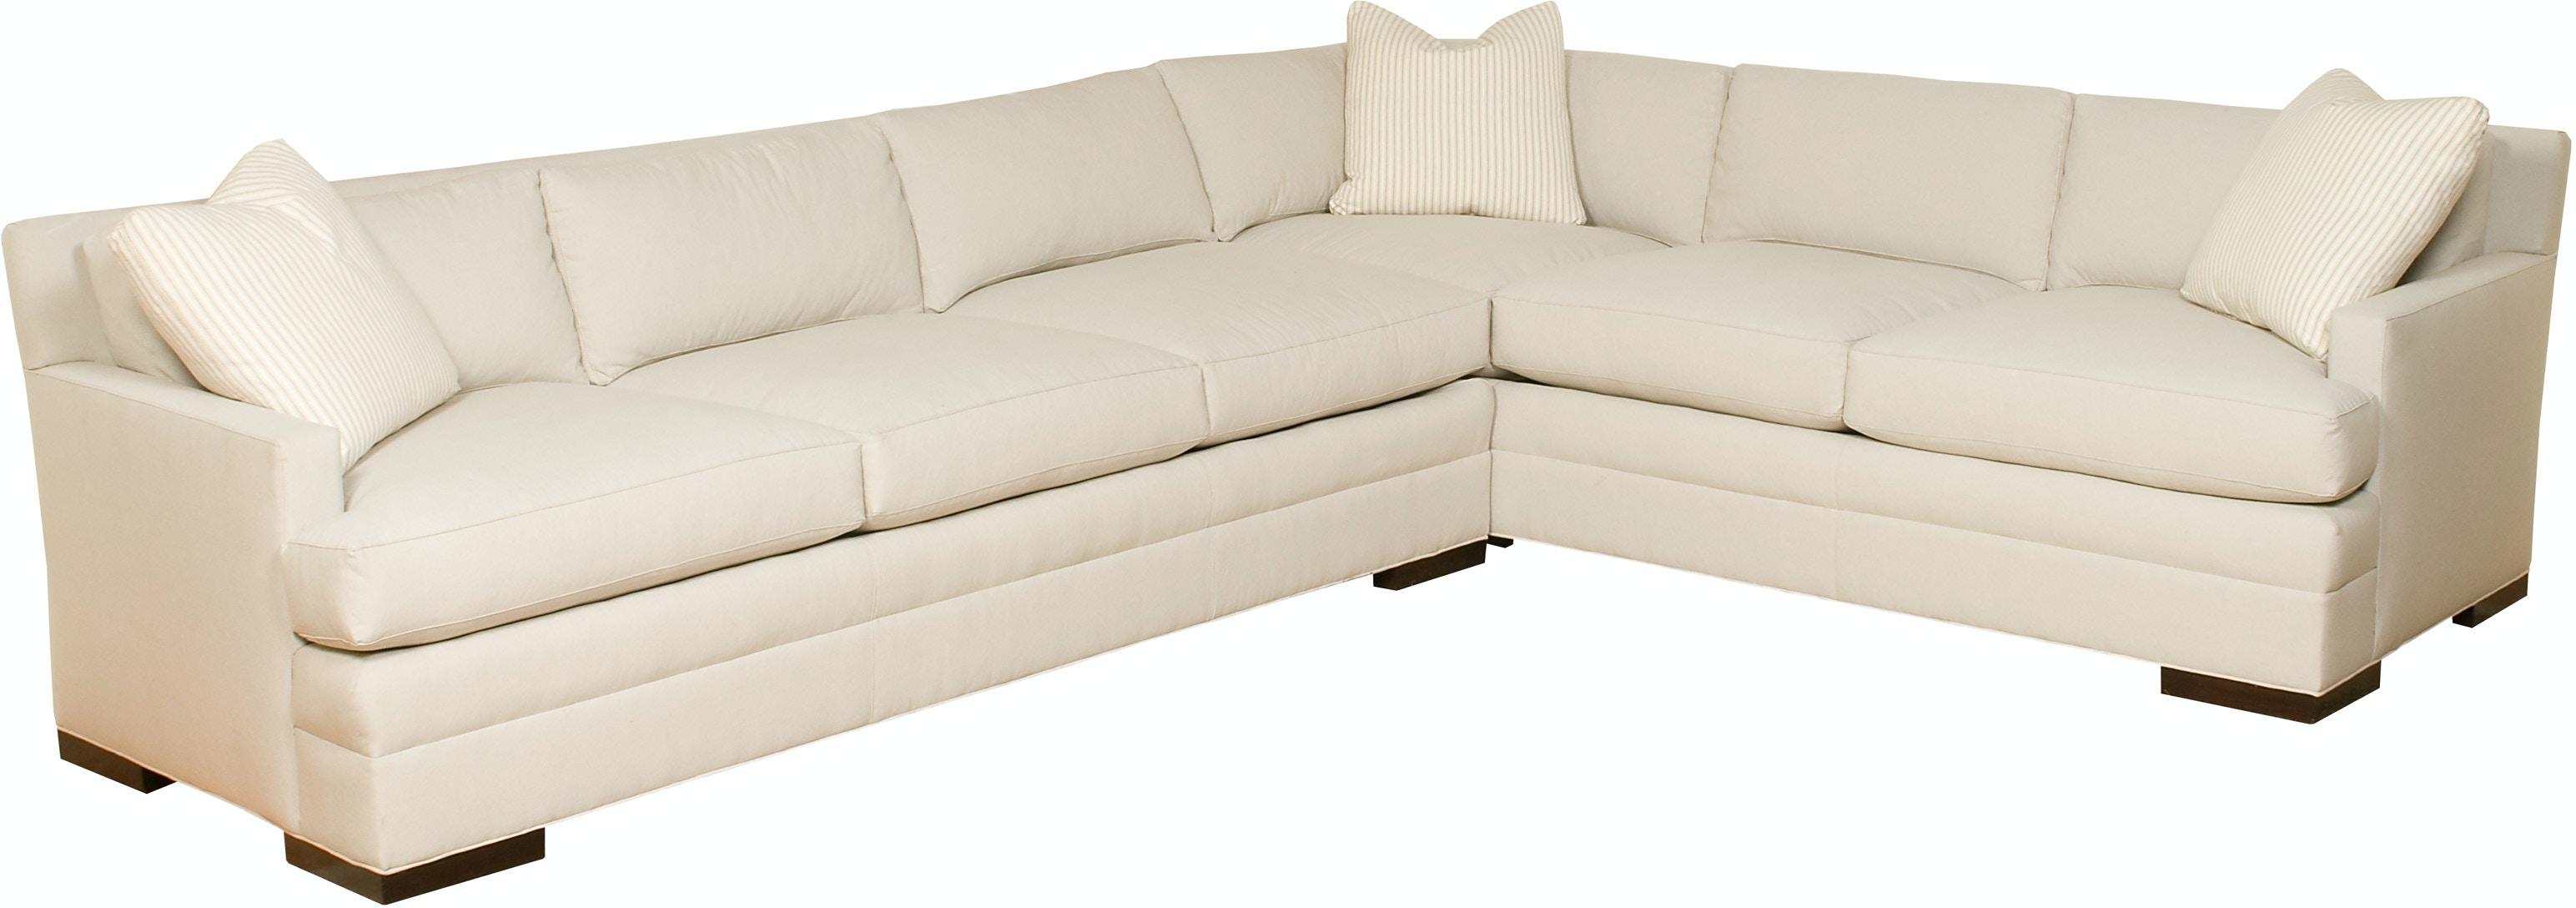 Vanguard Furniture 608 LAS Living Room Newberry Park Left Arm Sofa